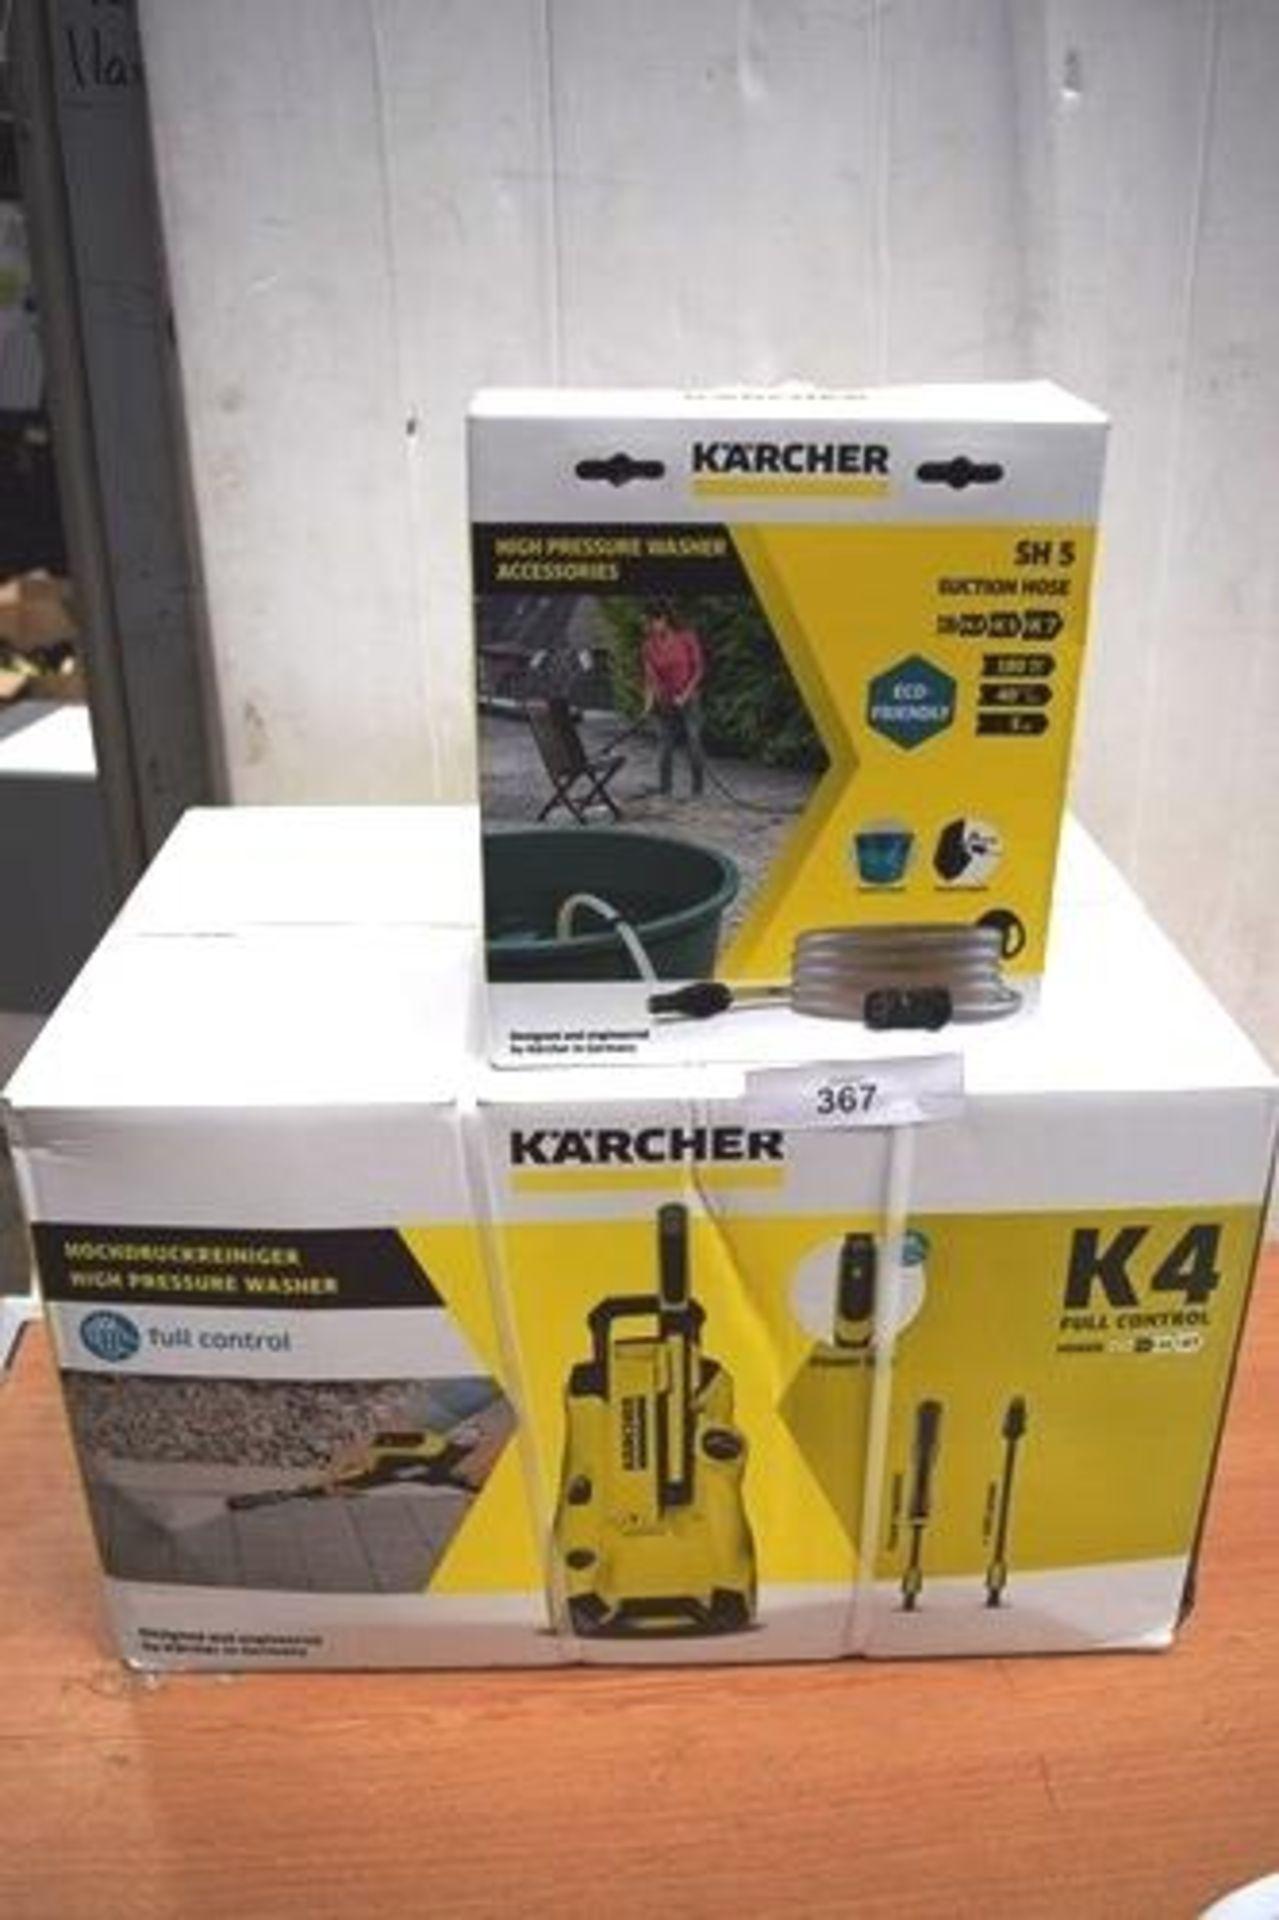 1 x K'Archer K4 full control high pressure washer, type 44FC, P.N. 1.324-002.0, 230 - 240V, together